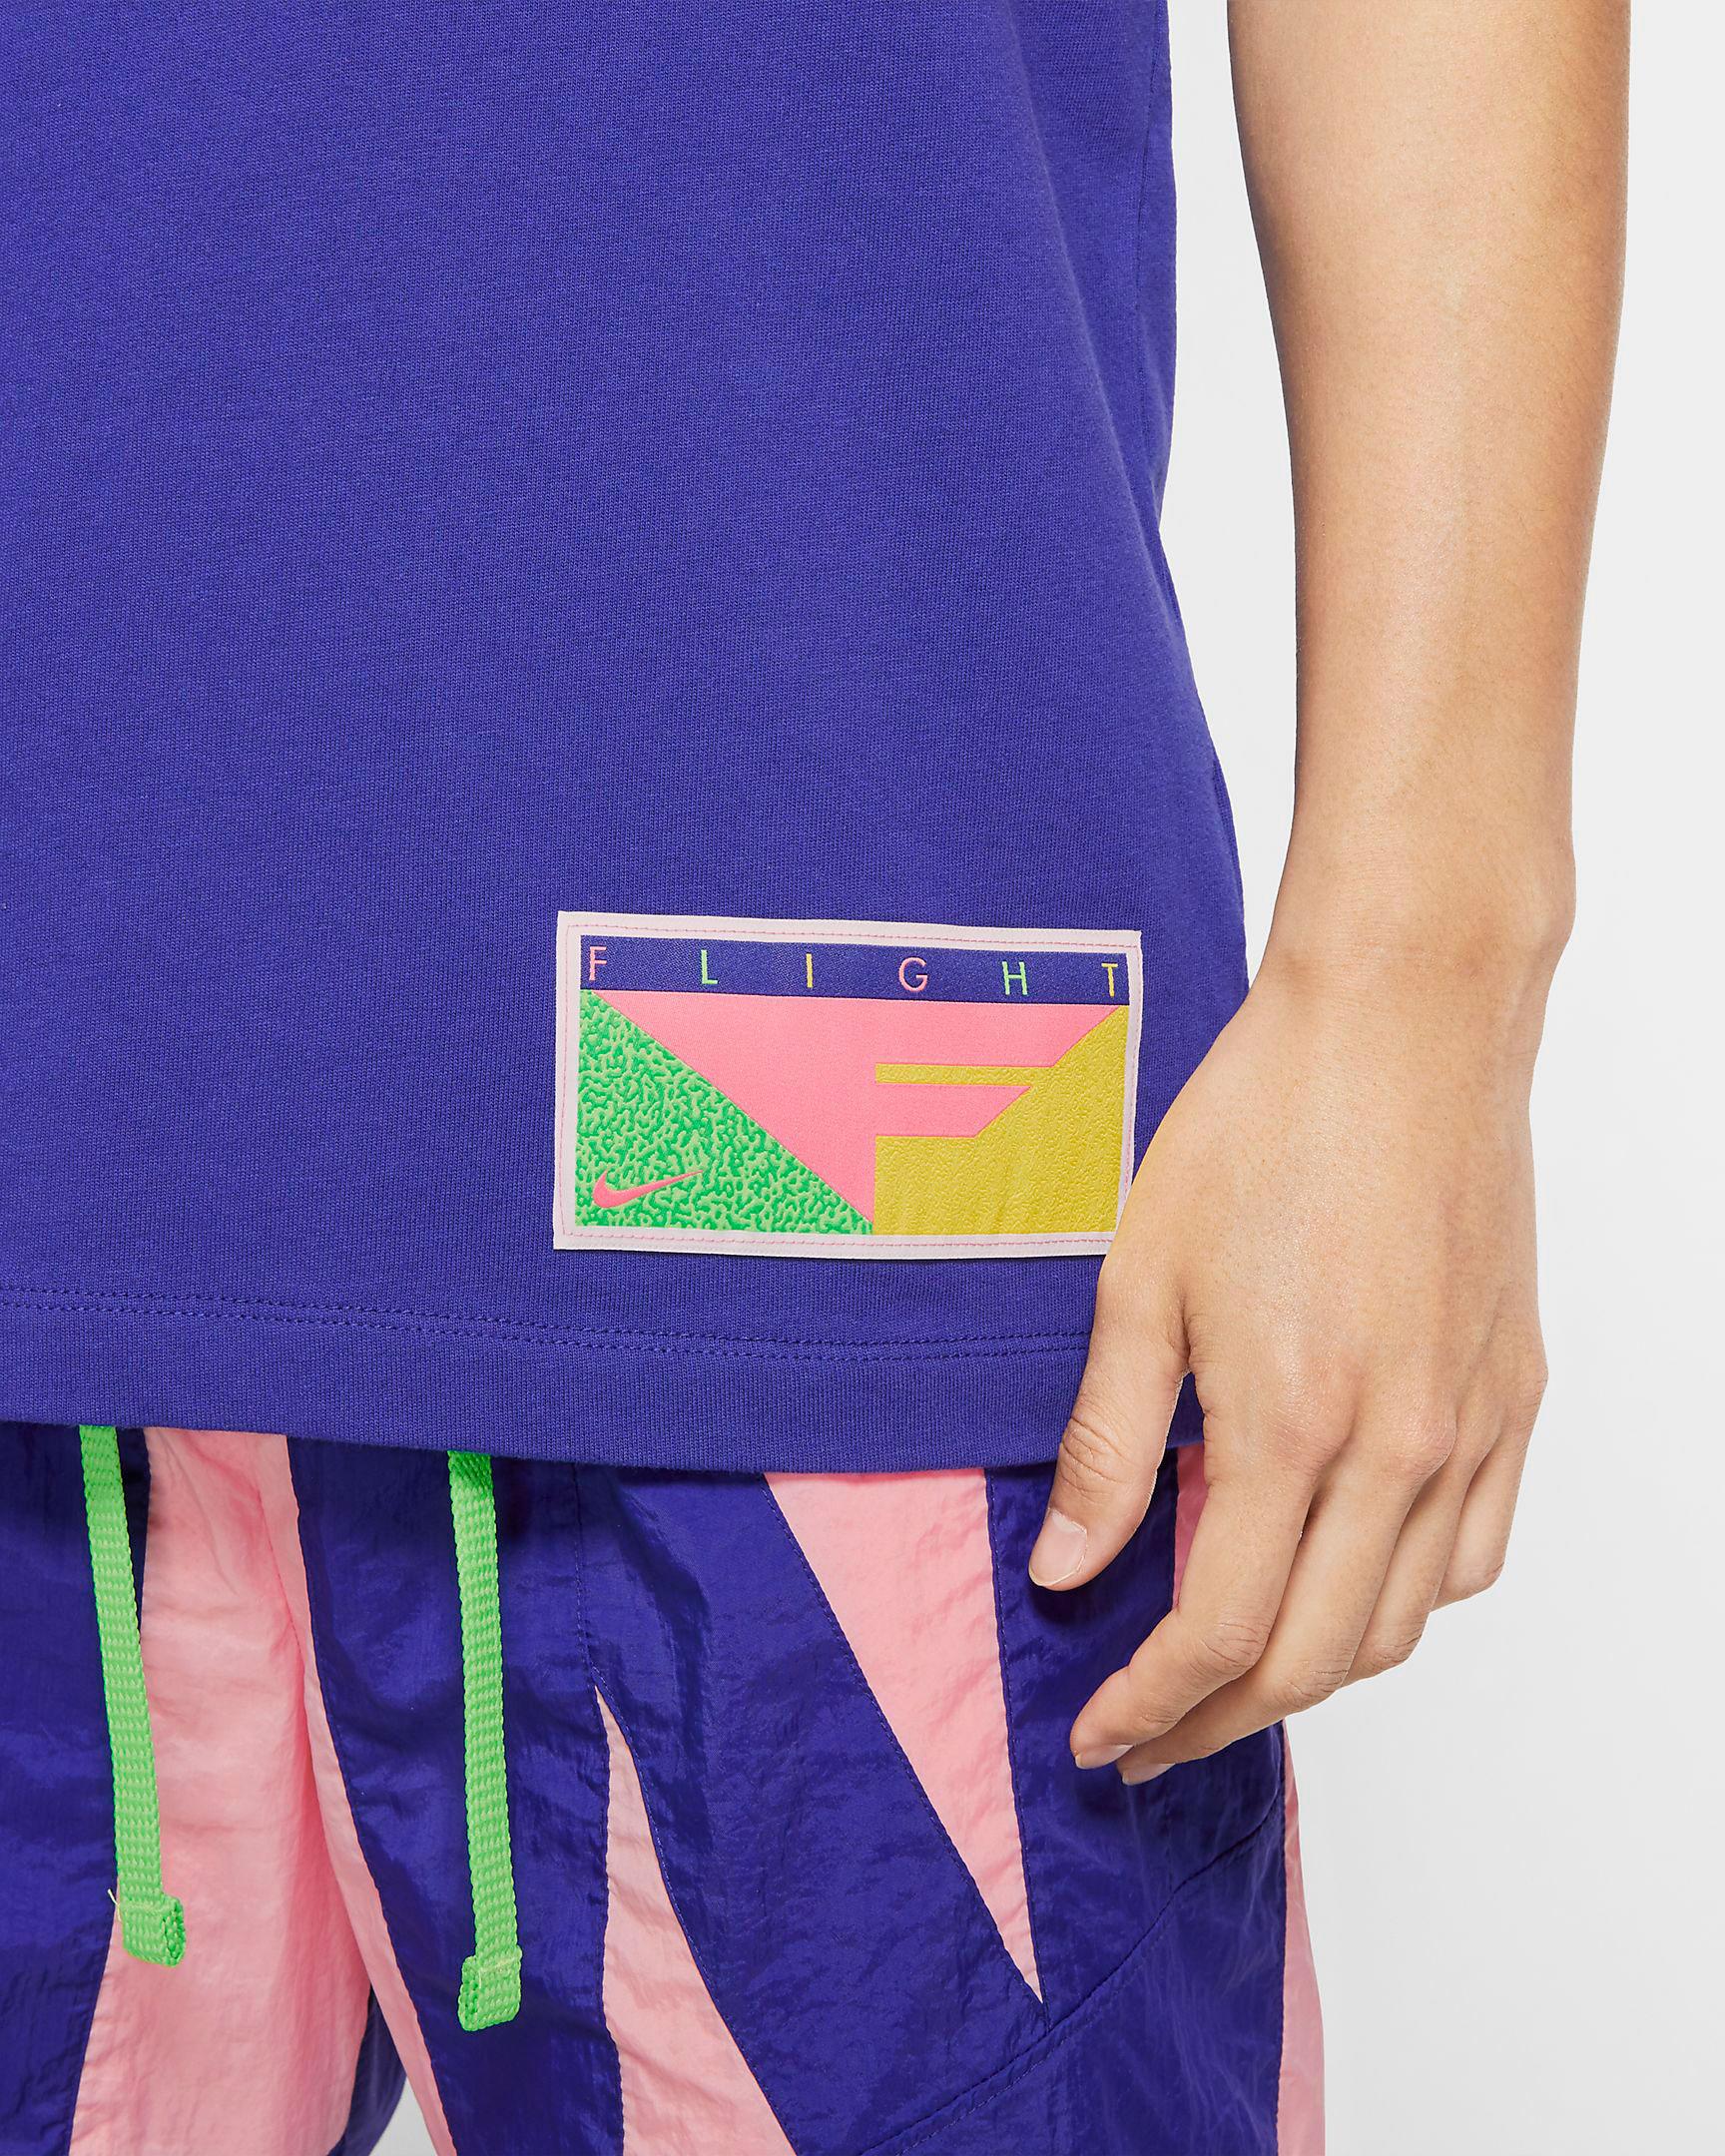 nike-flight-shirt-purple-pink-3